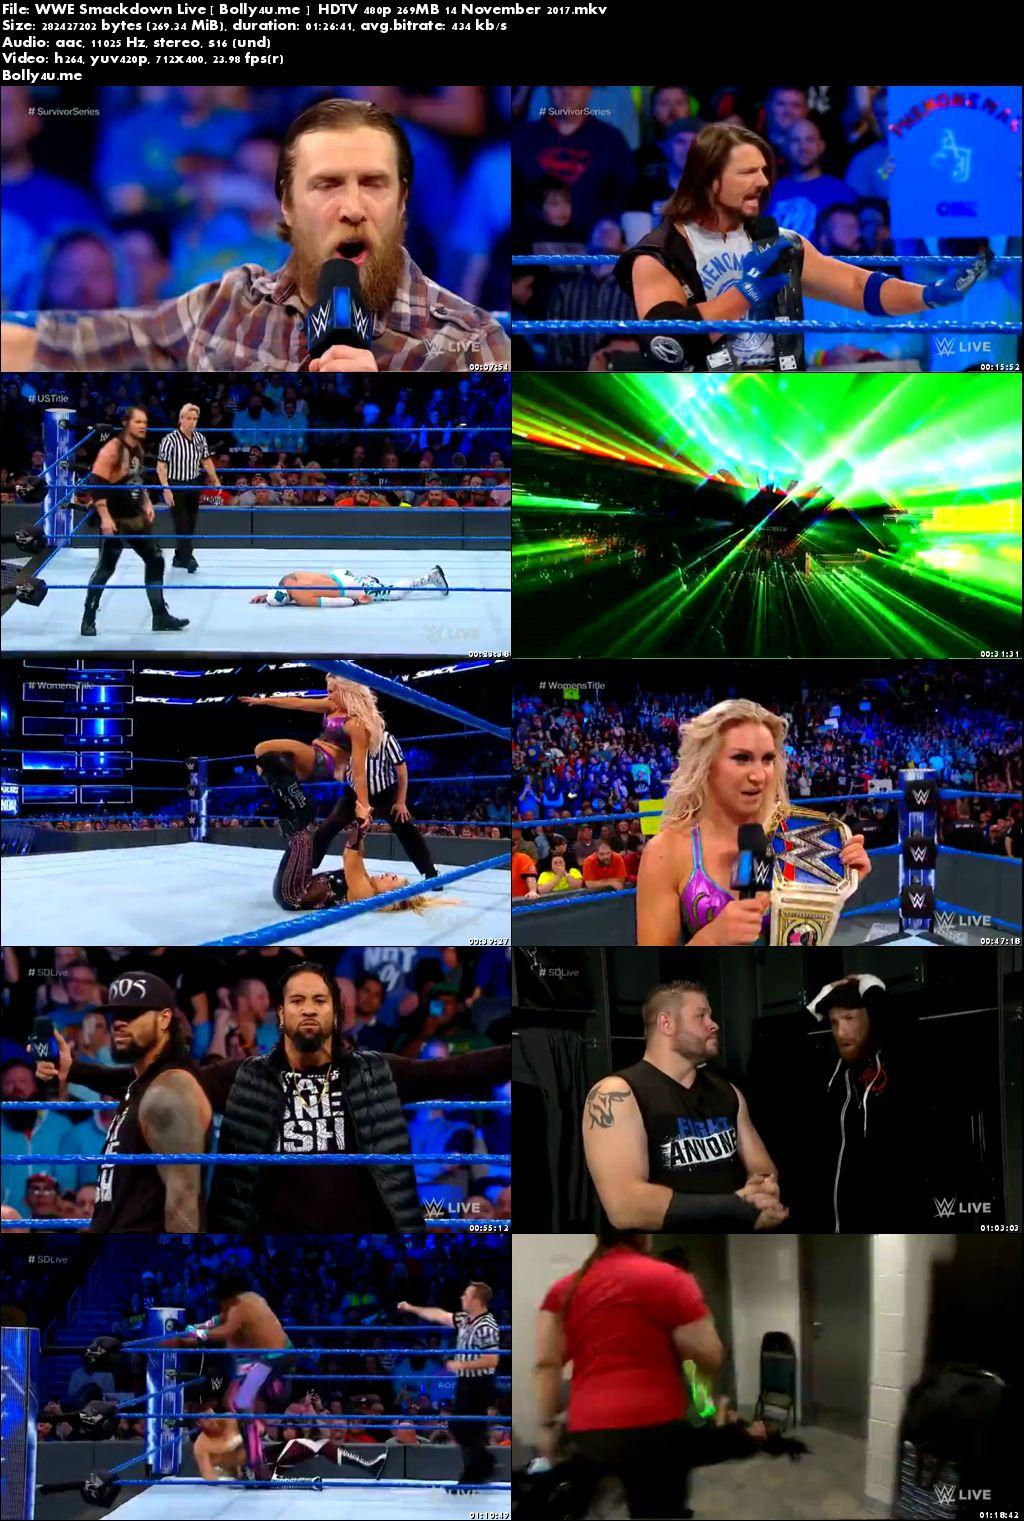 WWE SmackDown Live HDTV 480p 250MB 14 November 2017 Download